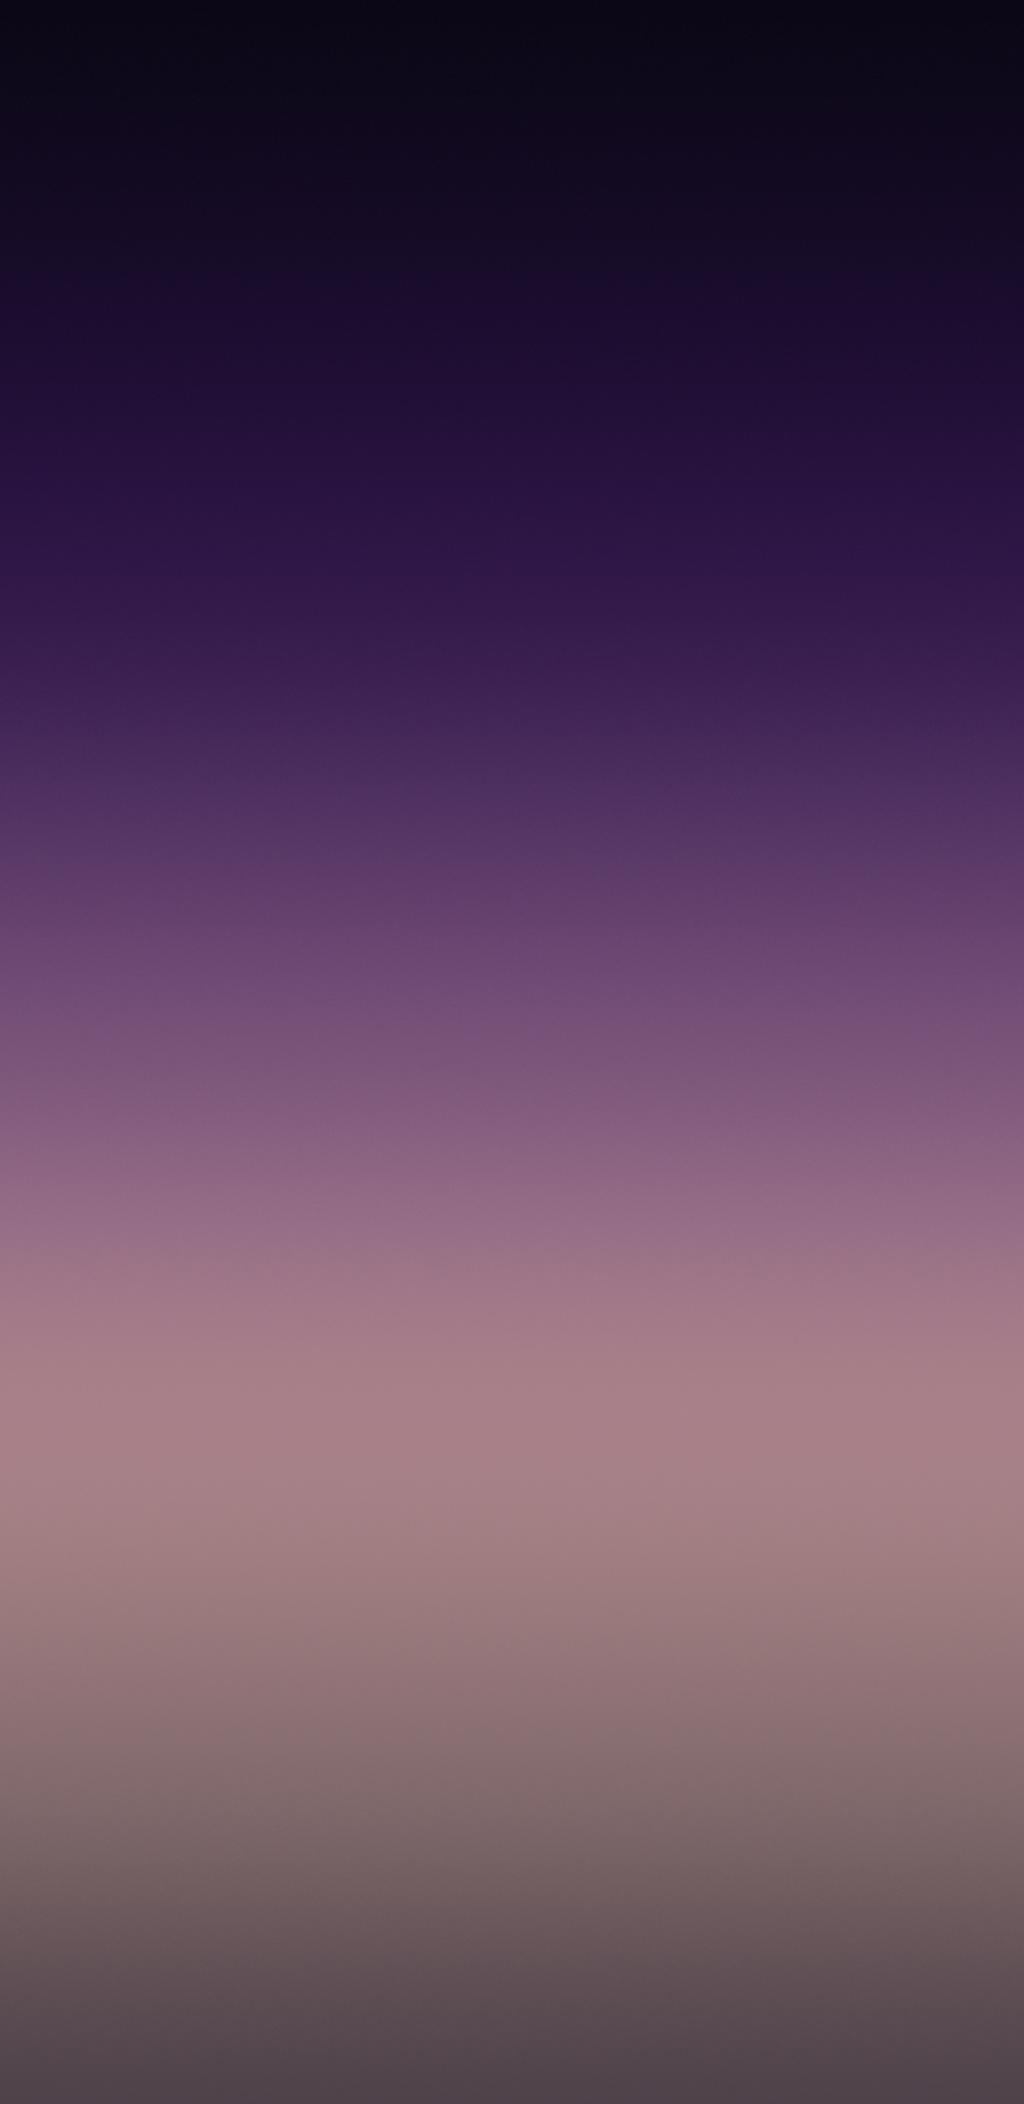 Galaxy S8紫色背景 S8 Wallpaper Original 1024x2104 Download Hd Wallpaper Wallpapertip